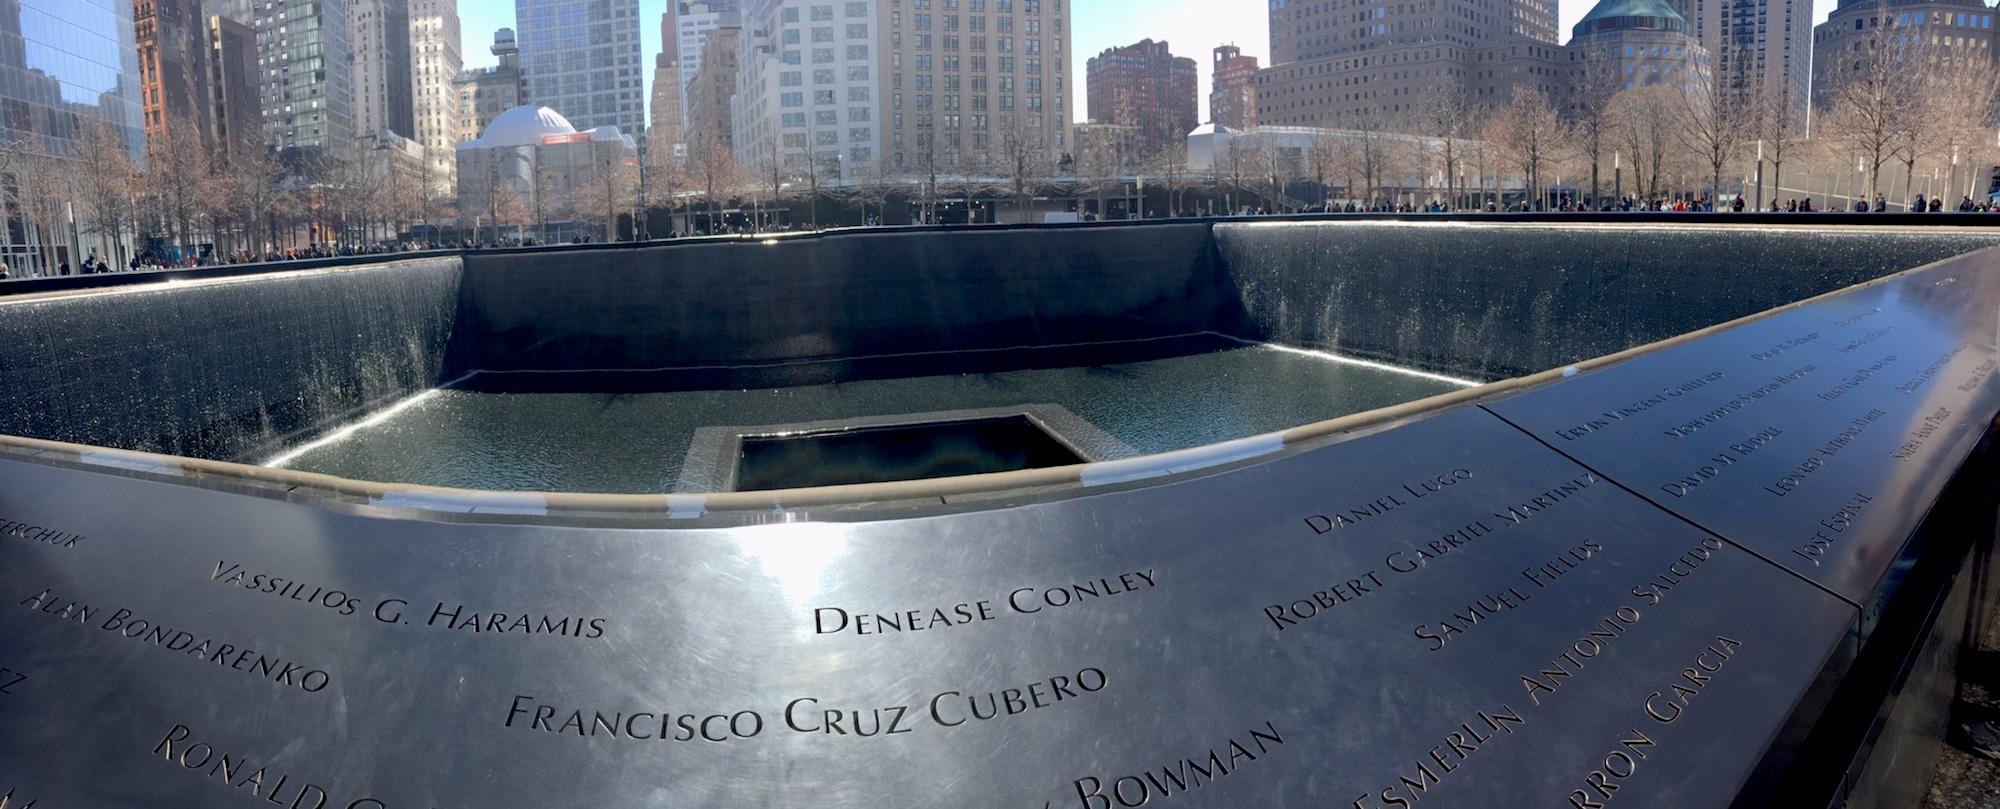 Water cascades into a deep fountain at the National September 11 Memorial.